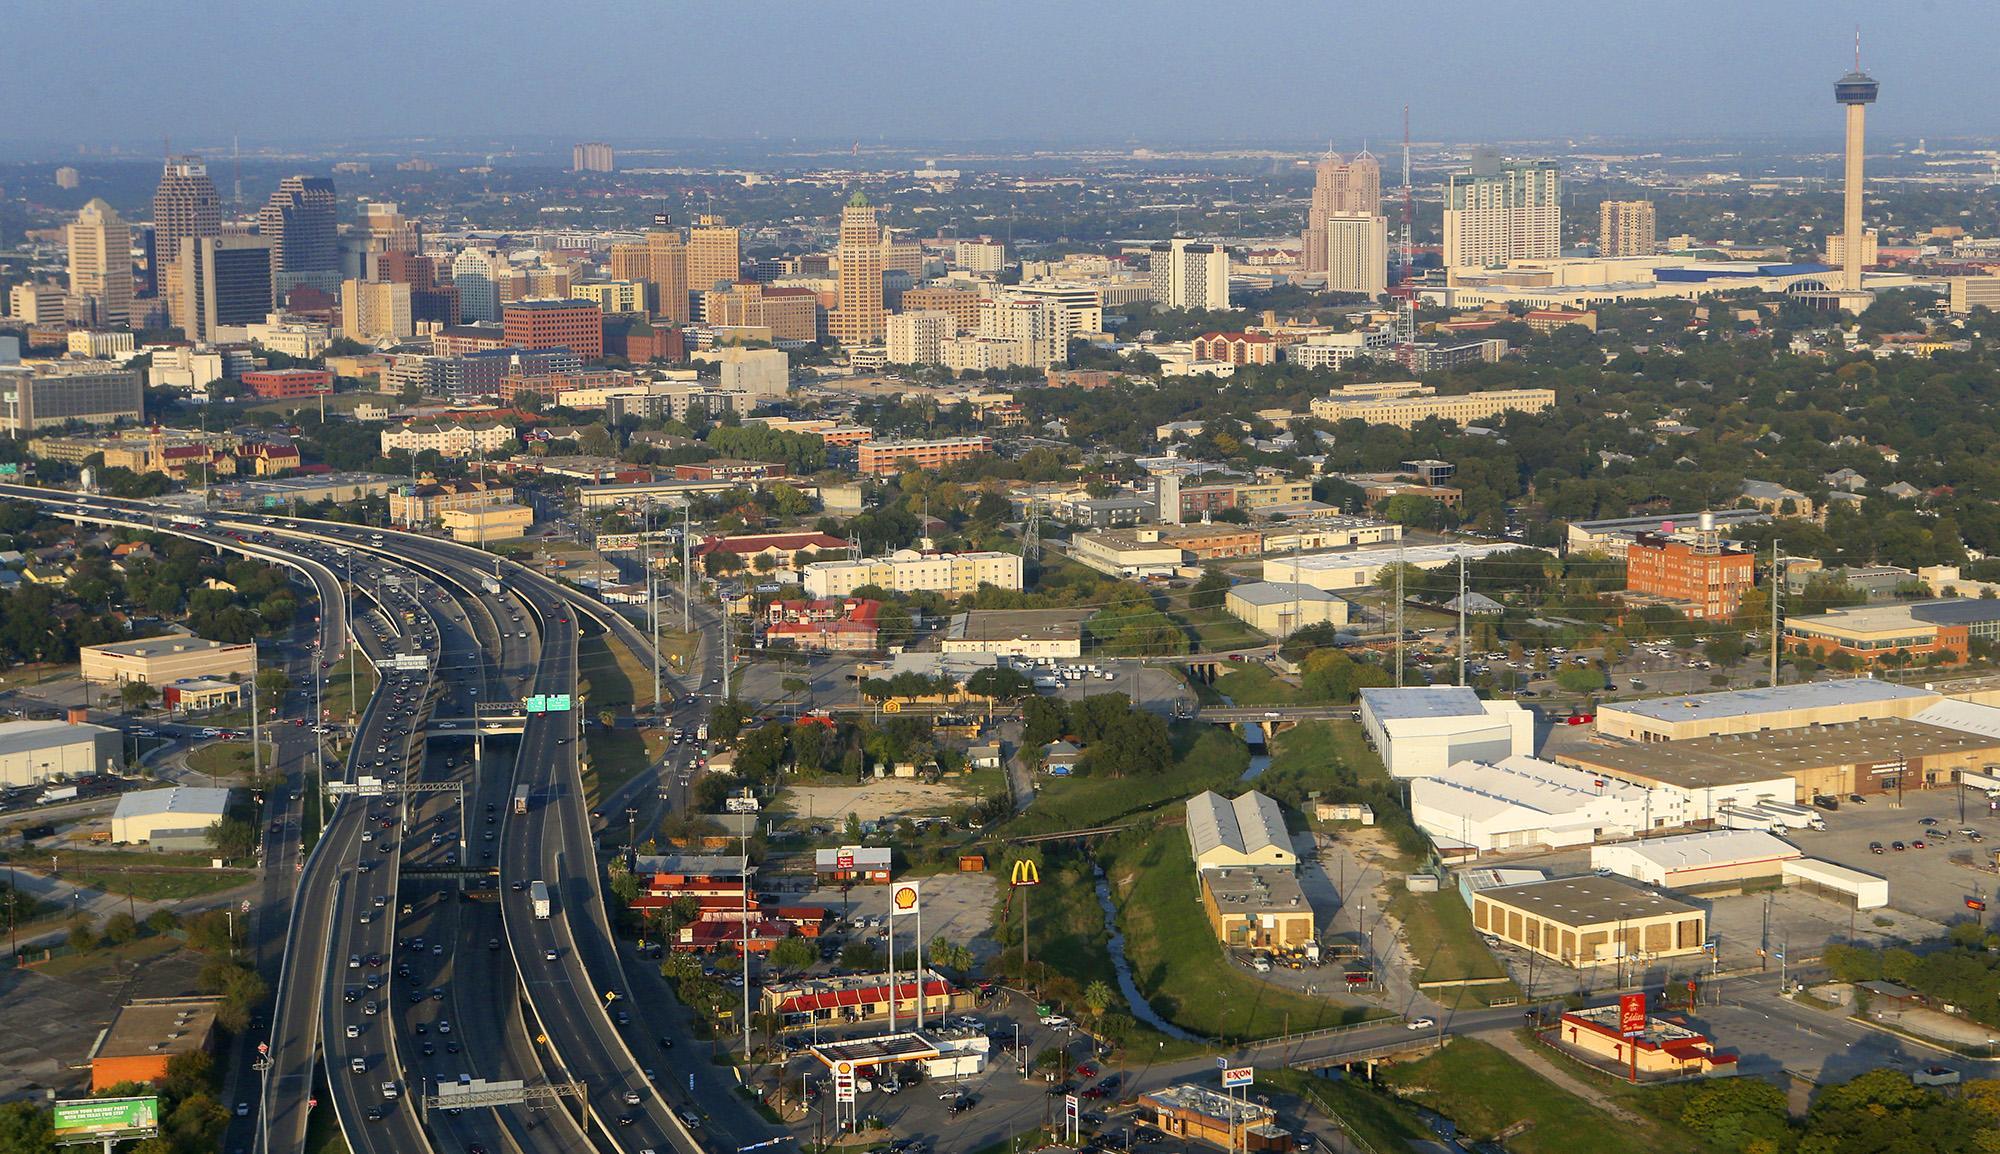 Homeland Security gives San Antonio $3.25M to combat terrorism